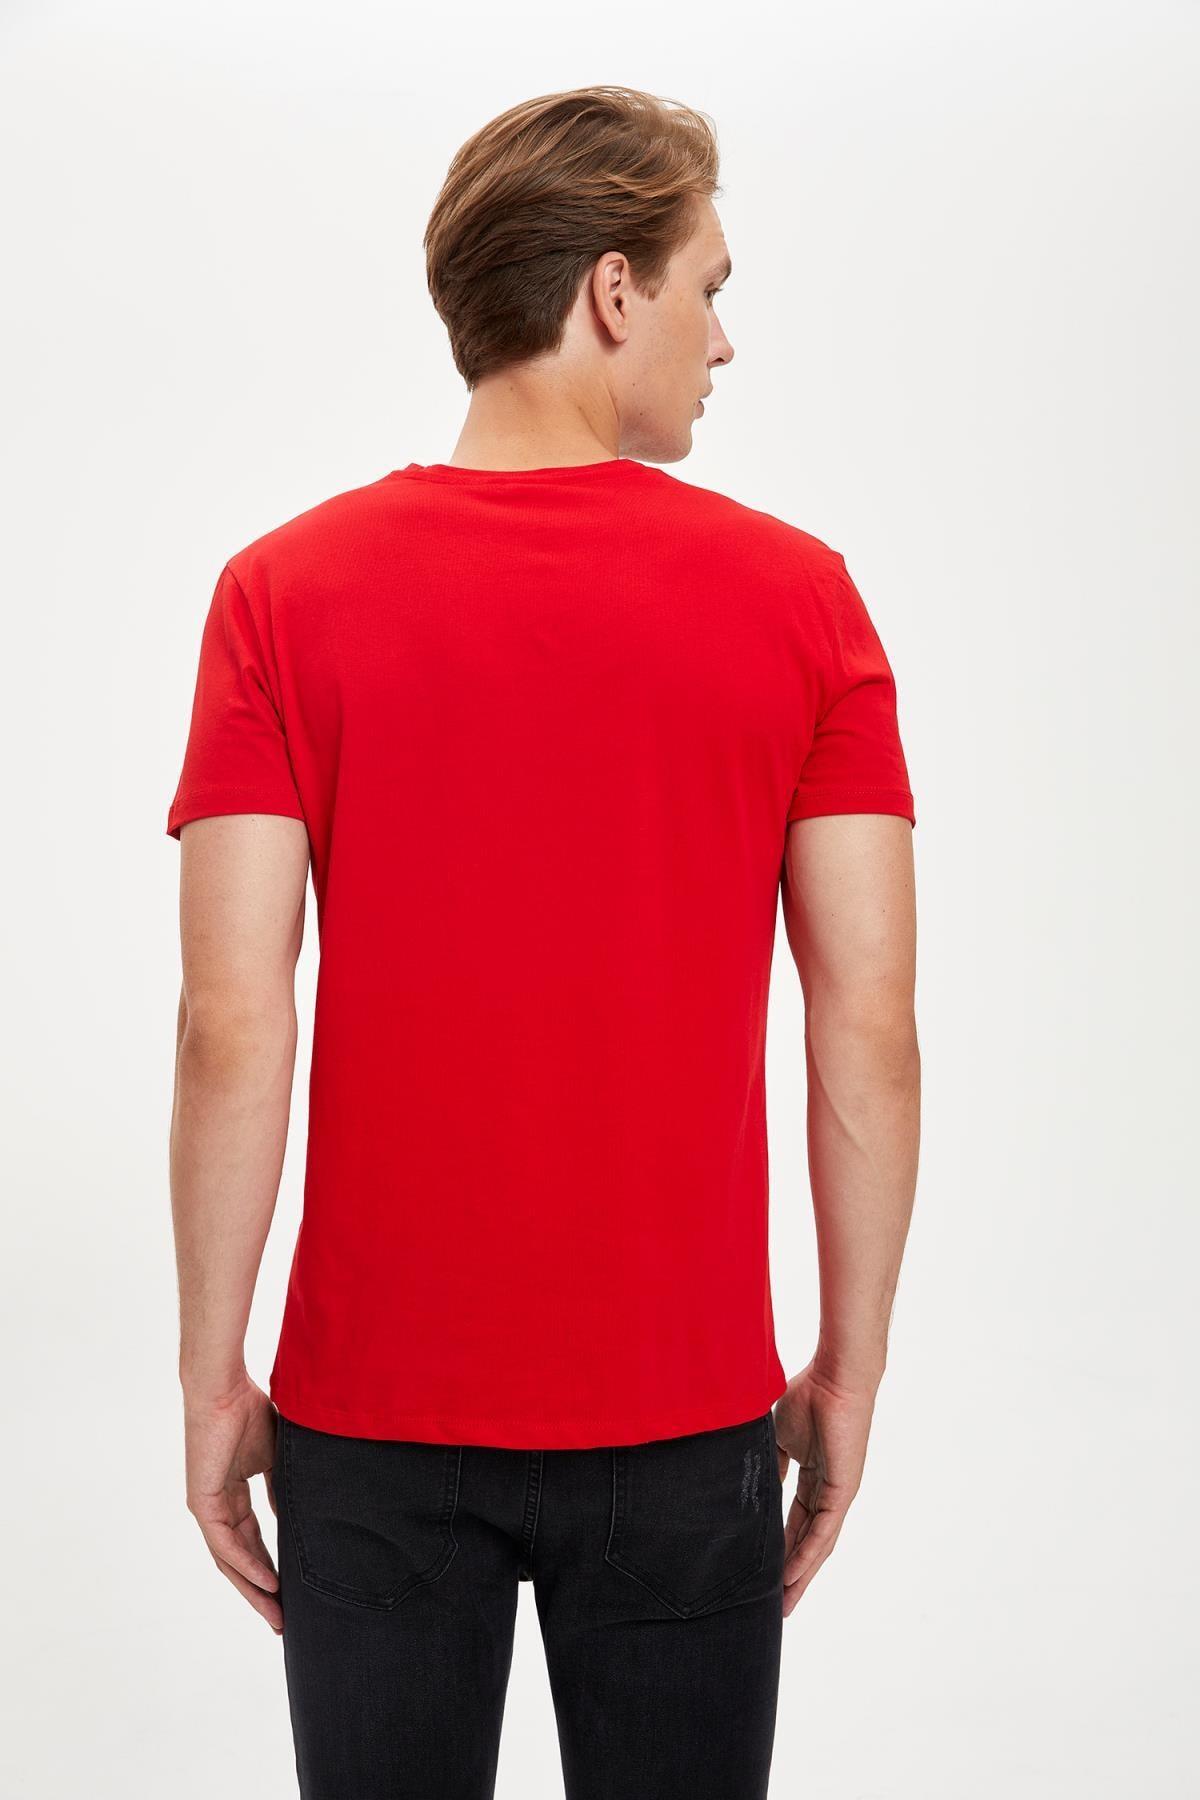 Defacto Erkek Kırmızı Warner Bros Flash Lisanslı Slim Fit Bisiklet Yaka Tişört 3